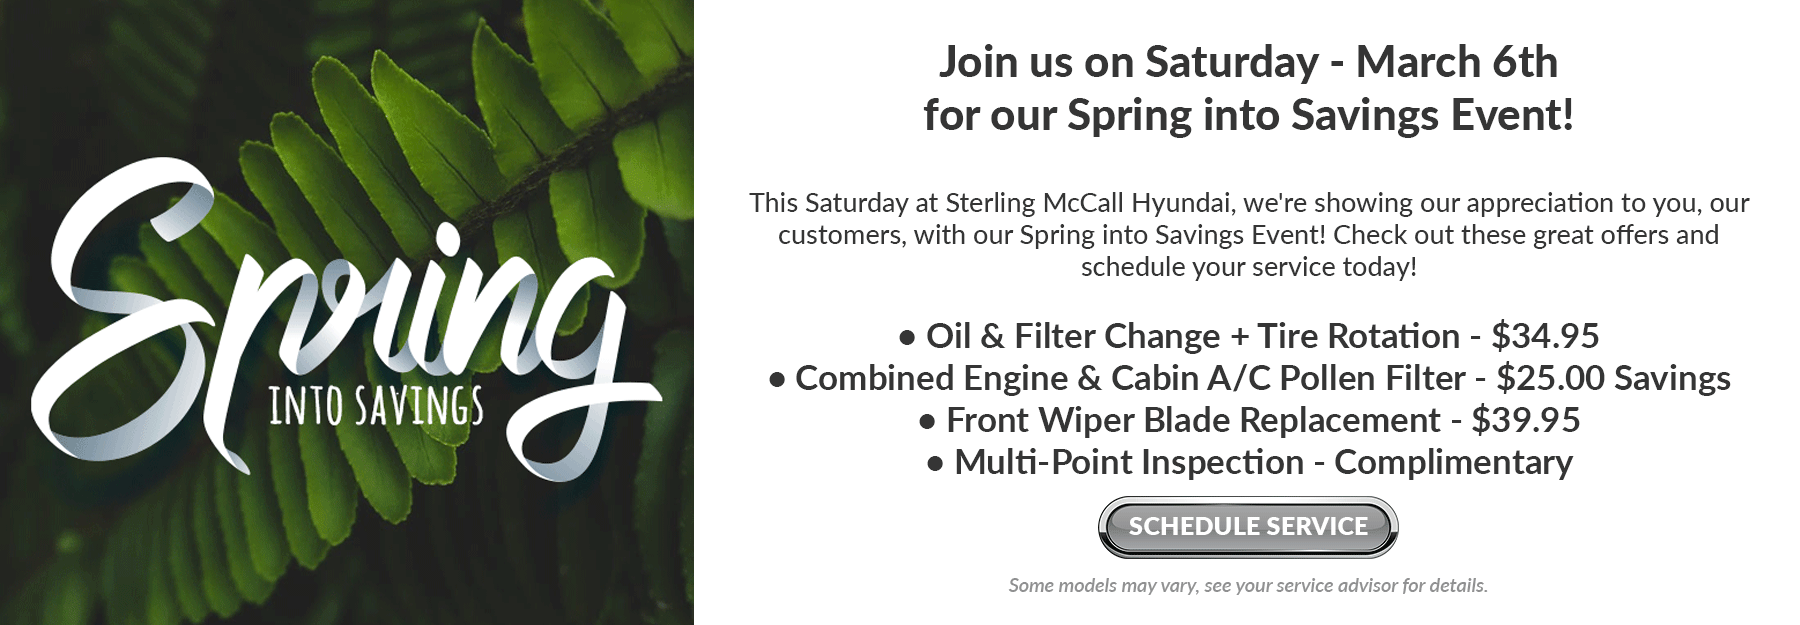 MARCH-web-Sterling-McCall-Hyundai